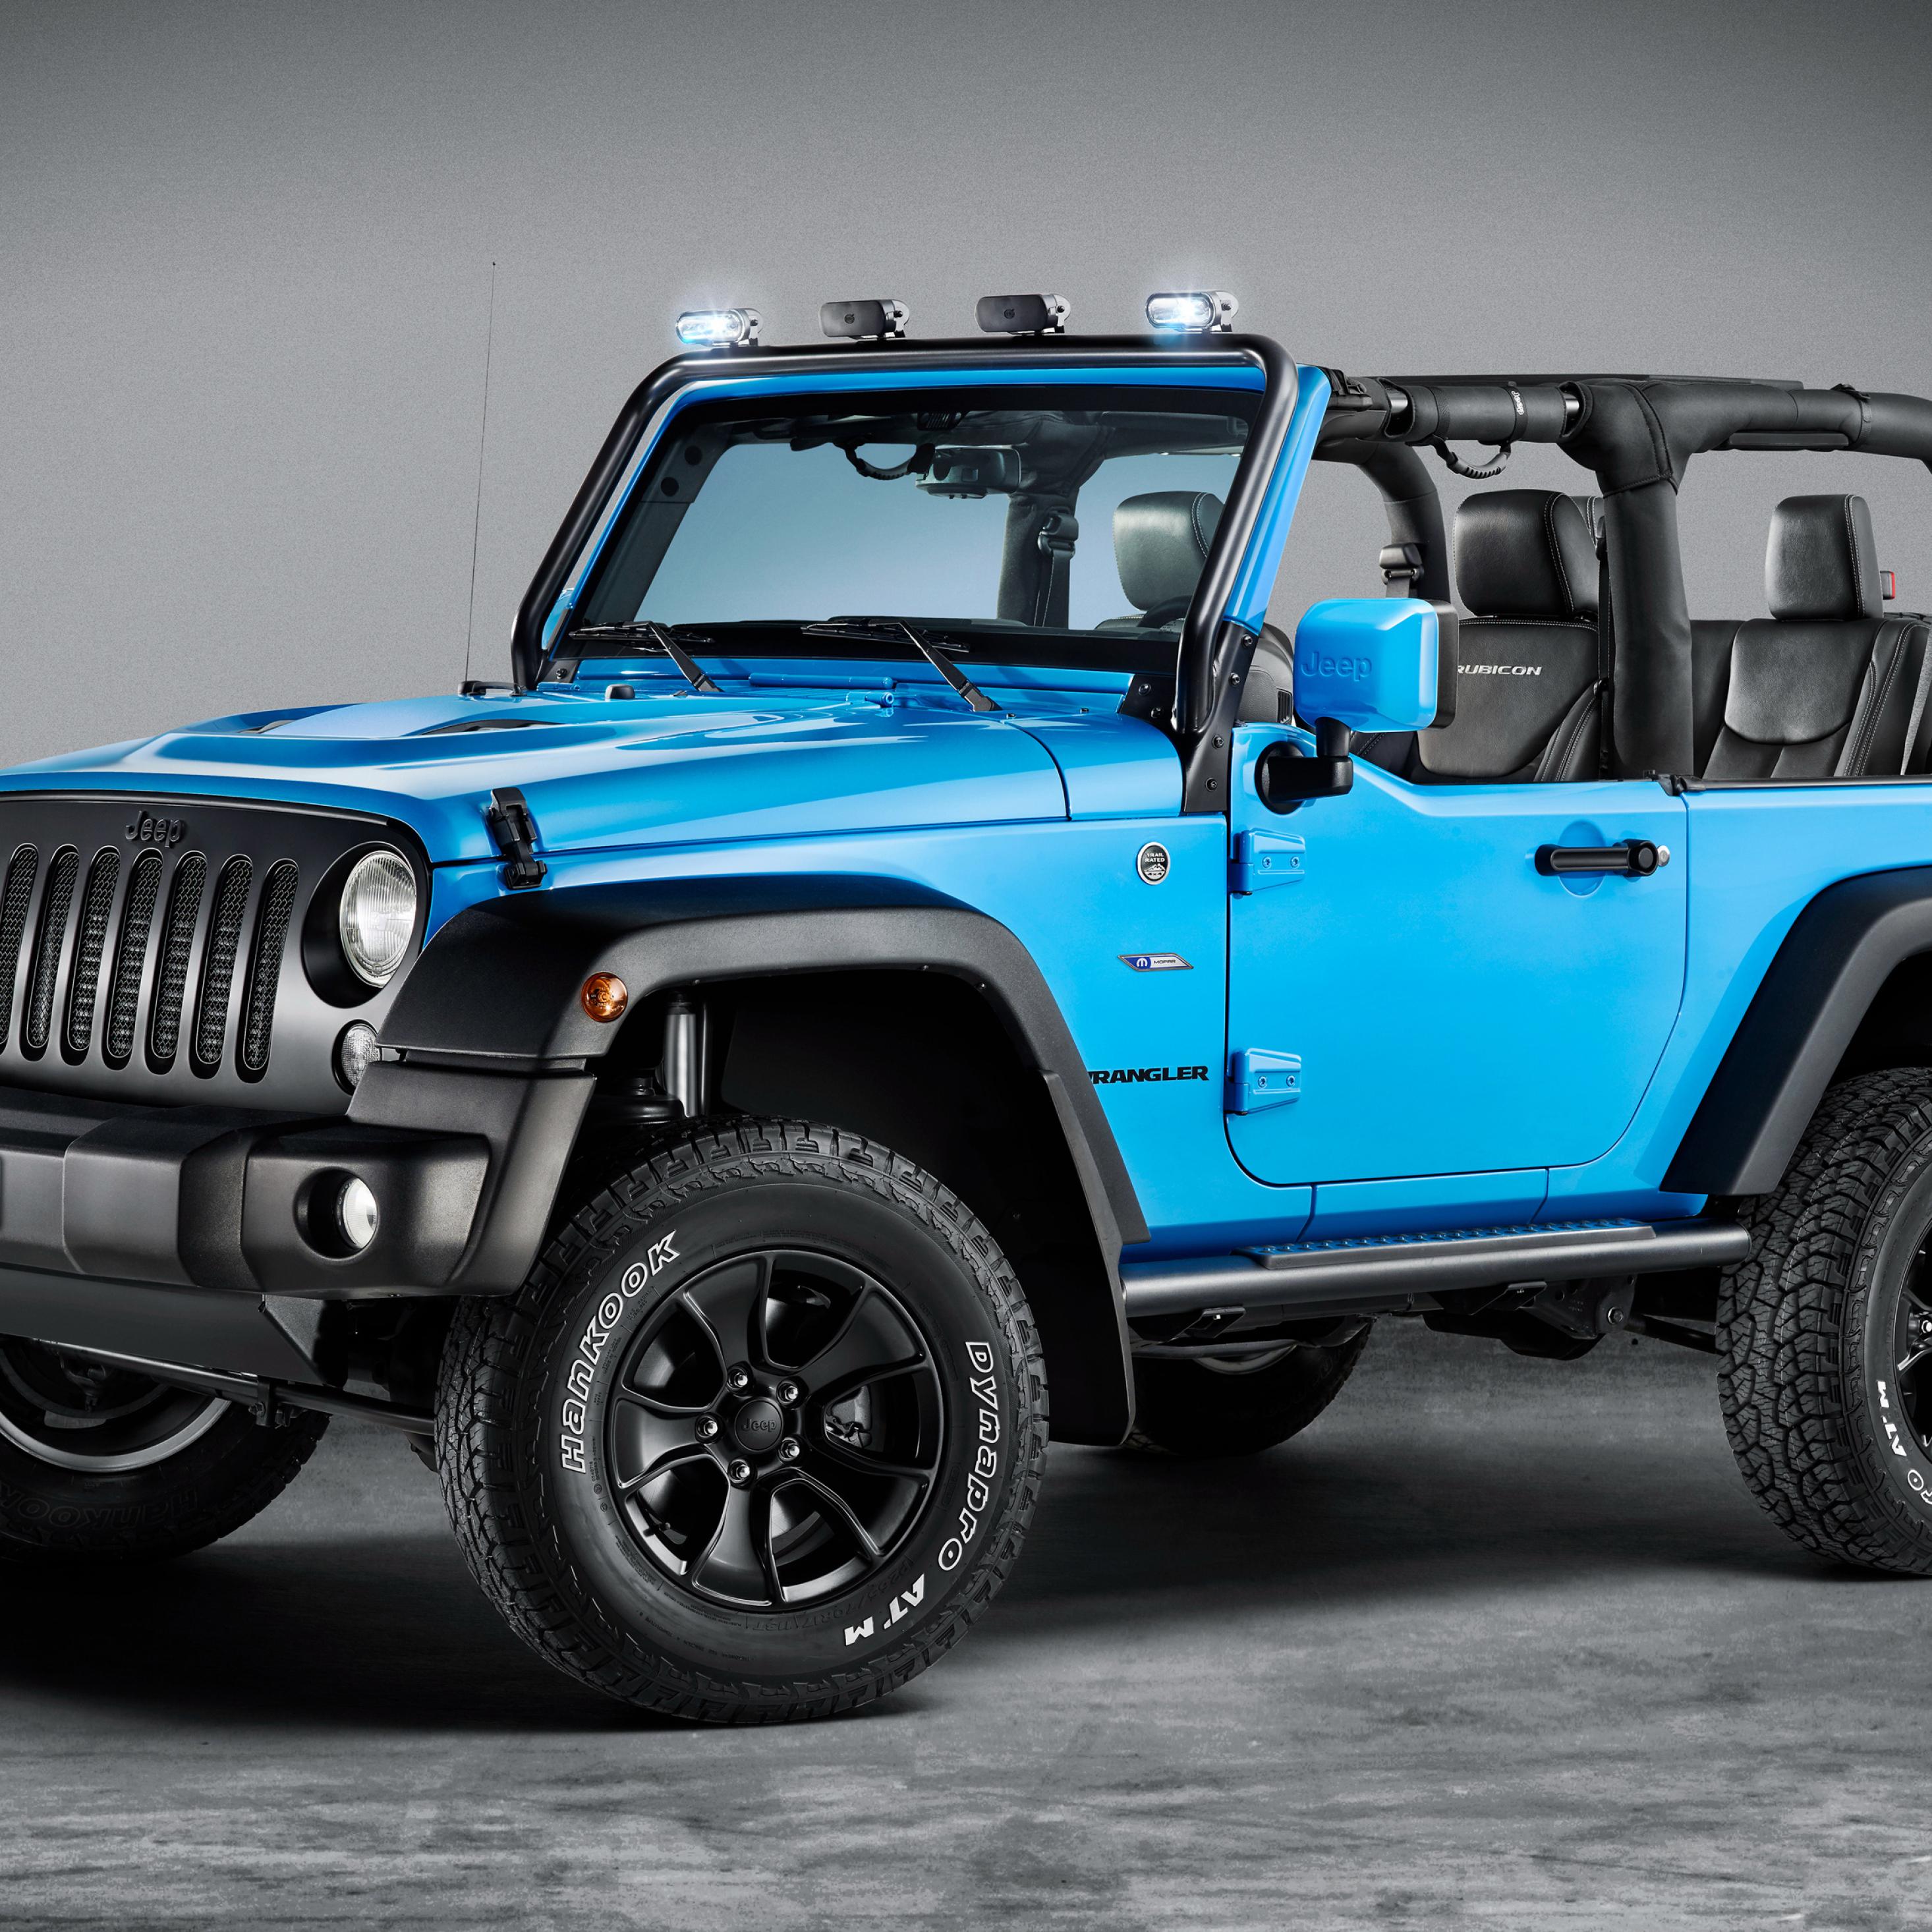 Blue Jeep Wrangler Rubicon, HD 4K Wallpaper